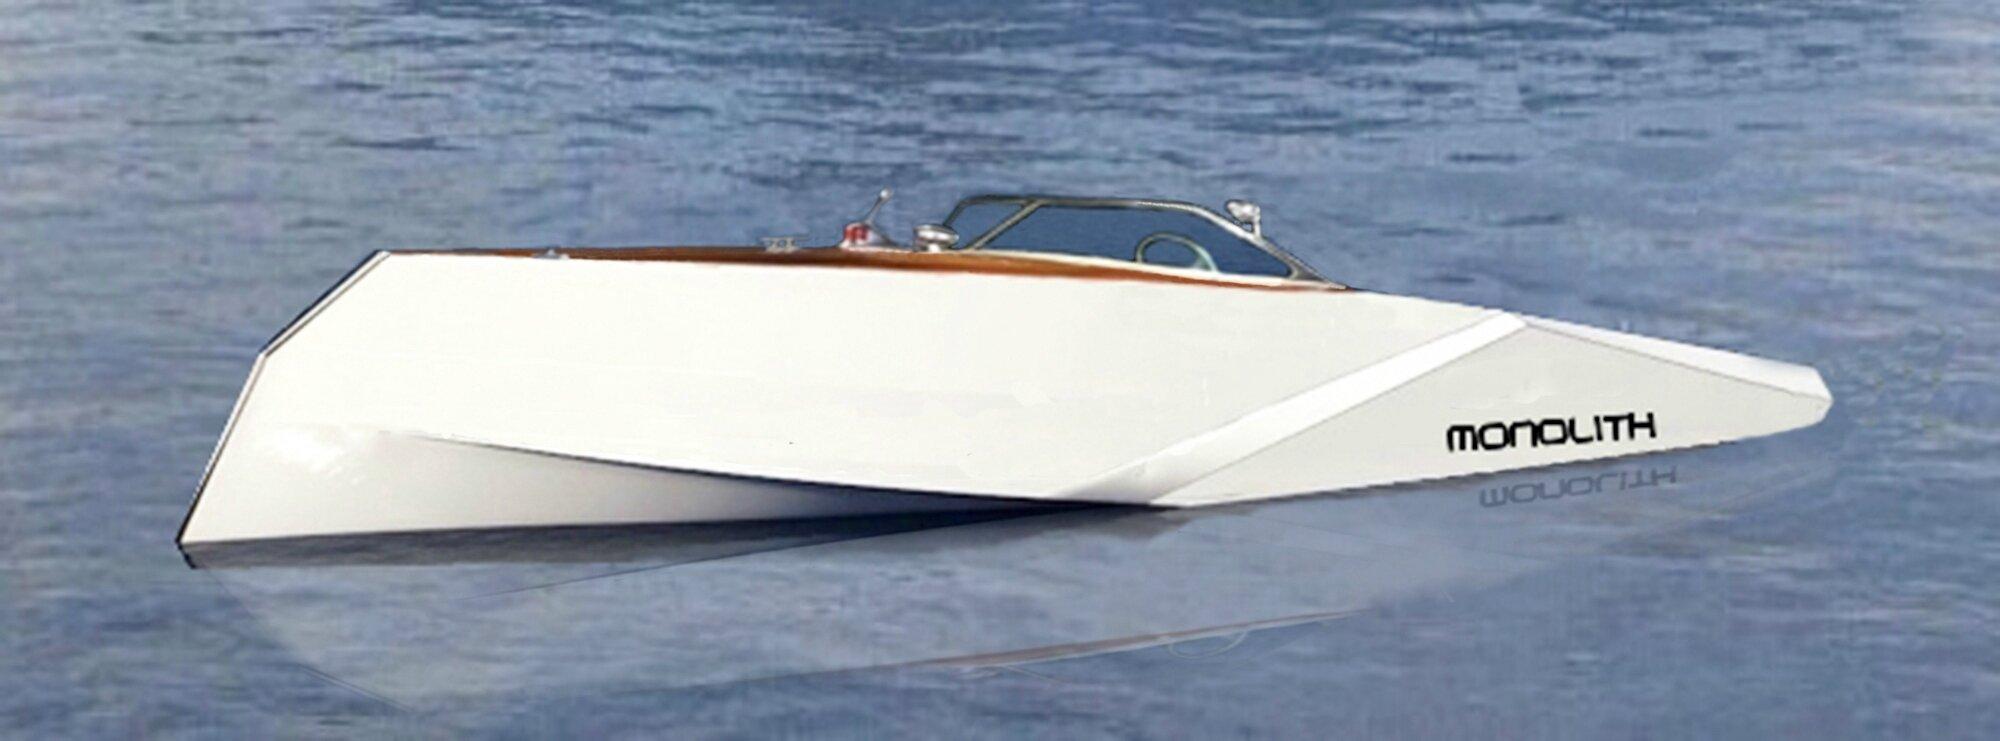 ,Motoryacht concept,ferrari boat,bentley boat,Megayacht,Megayacht design,Megayacht concept,monolith boat,super yacht,super yacht design,super yacht concept,Yacht Design Award,motorboat Design decatoire designer